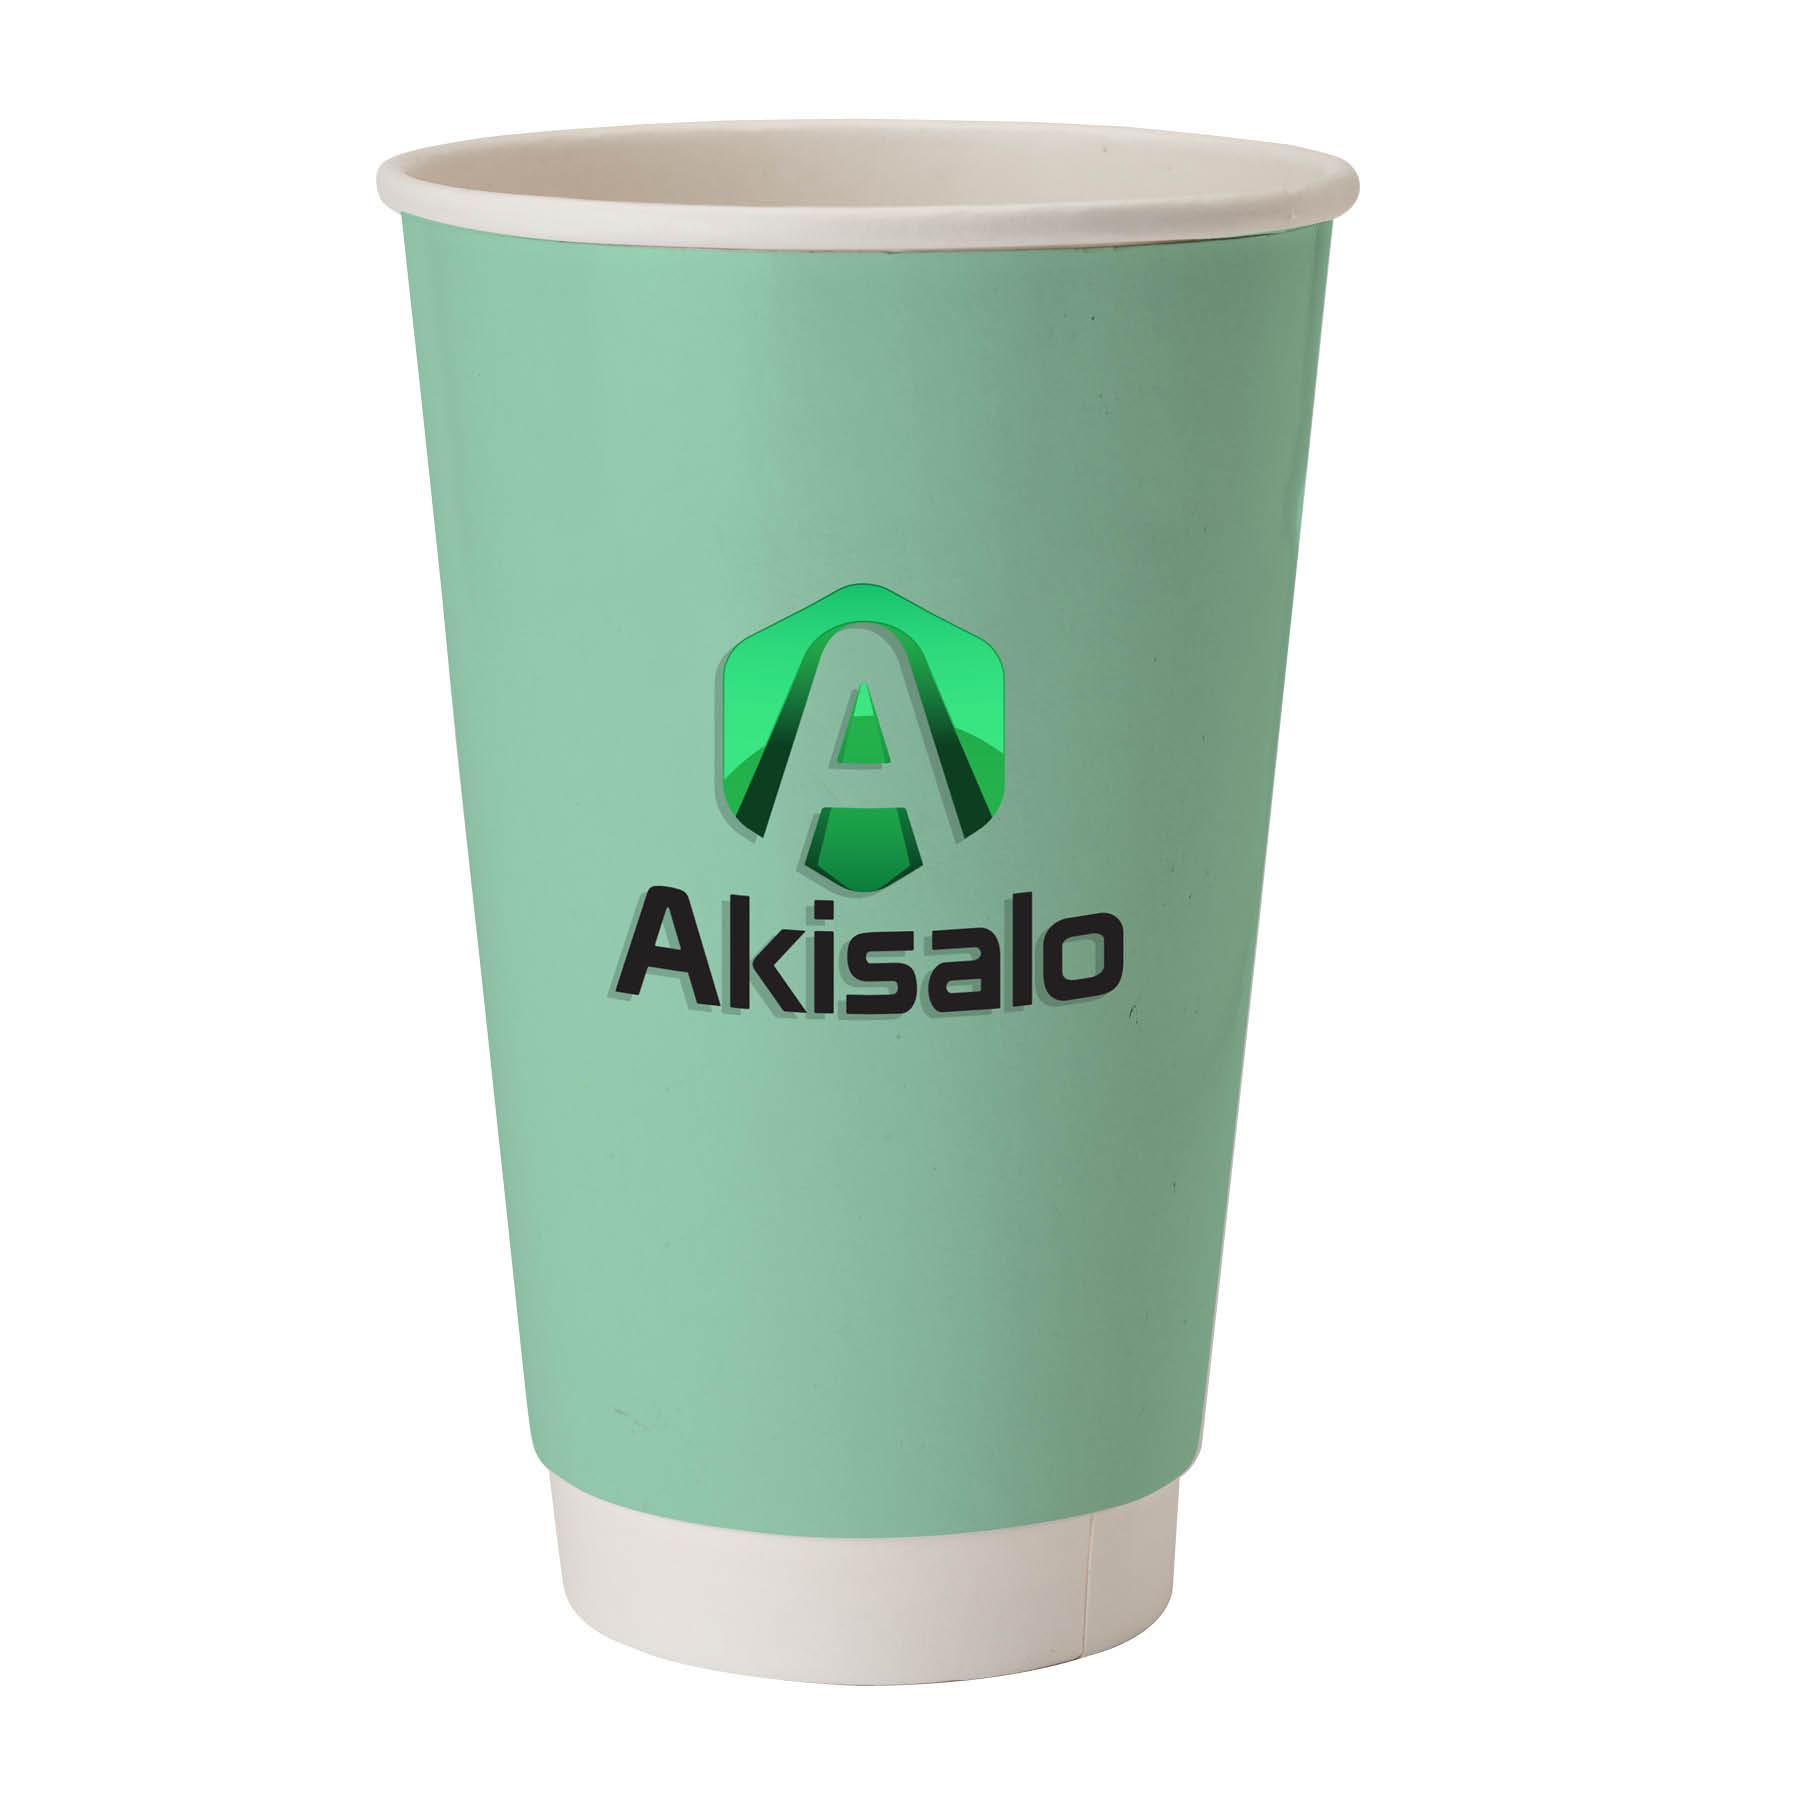 PerkaR 20oz Double Wall Paper Coffee Cup